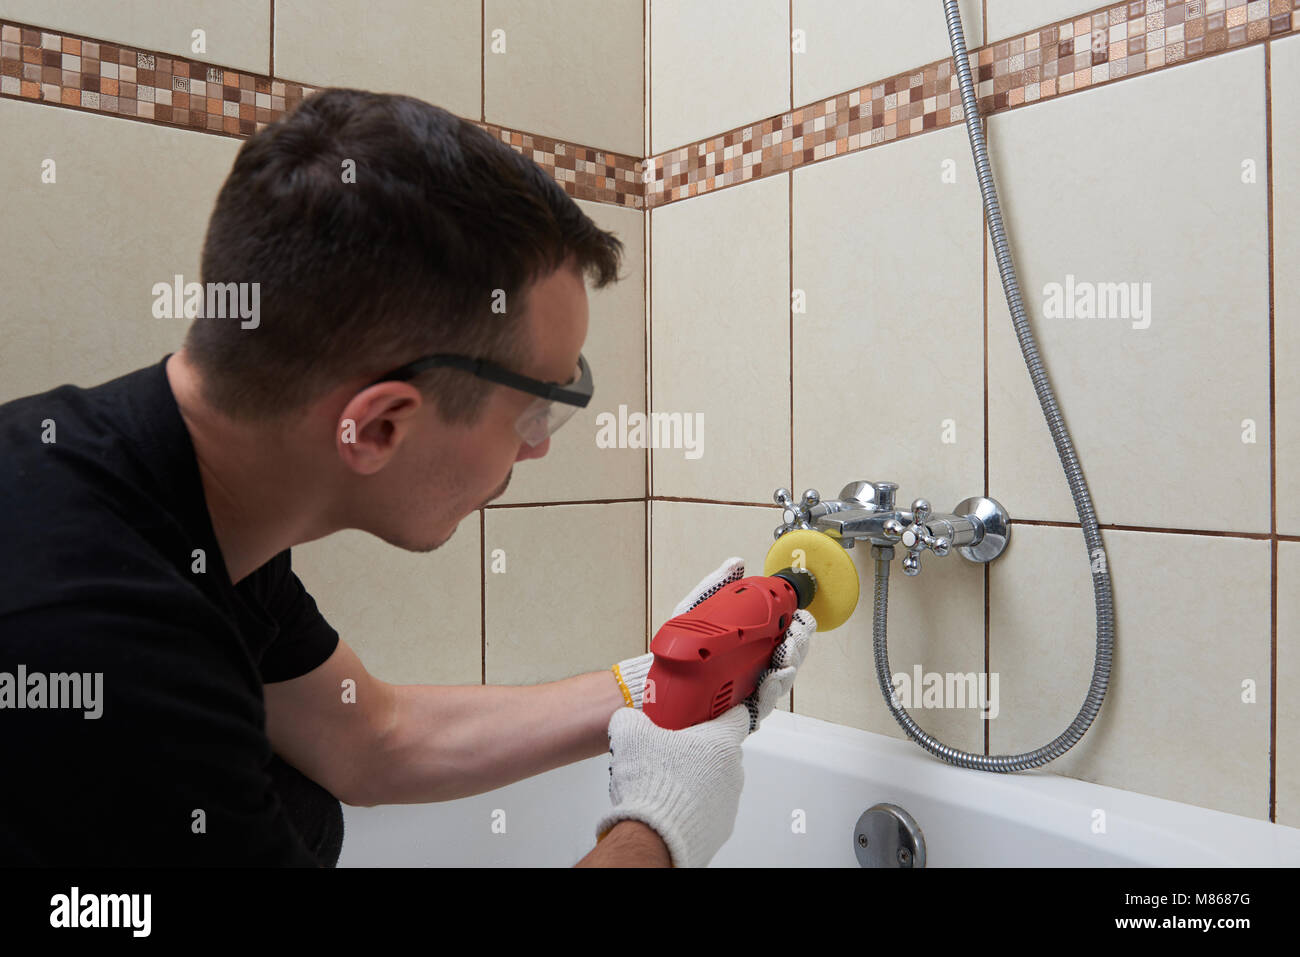 Vasca Da Casa : Da vasca a doccia trasformare vasca in box doccia